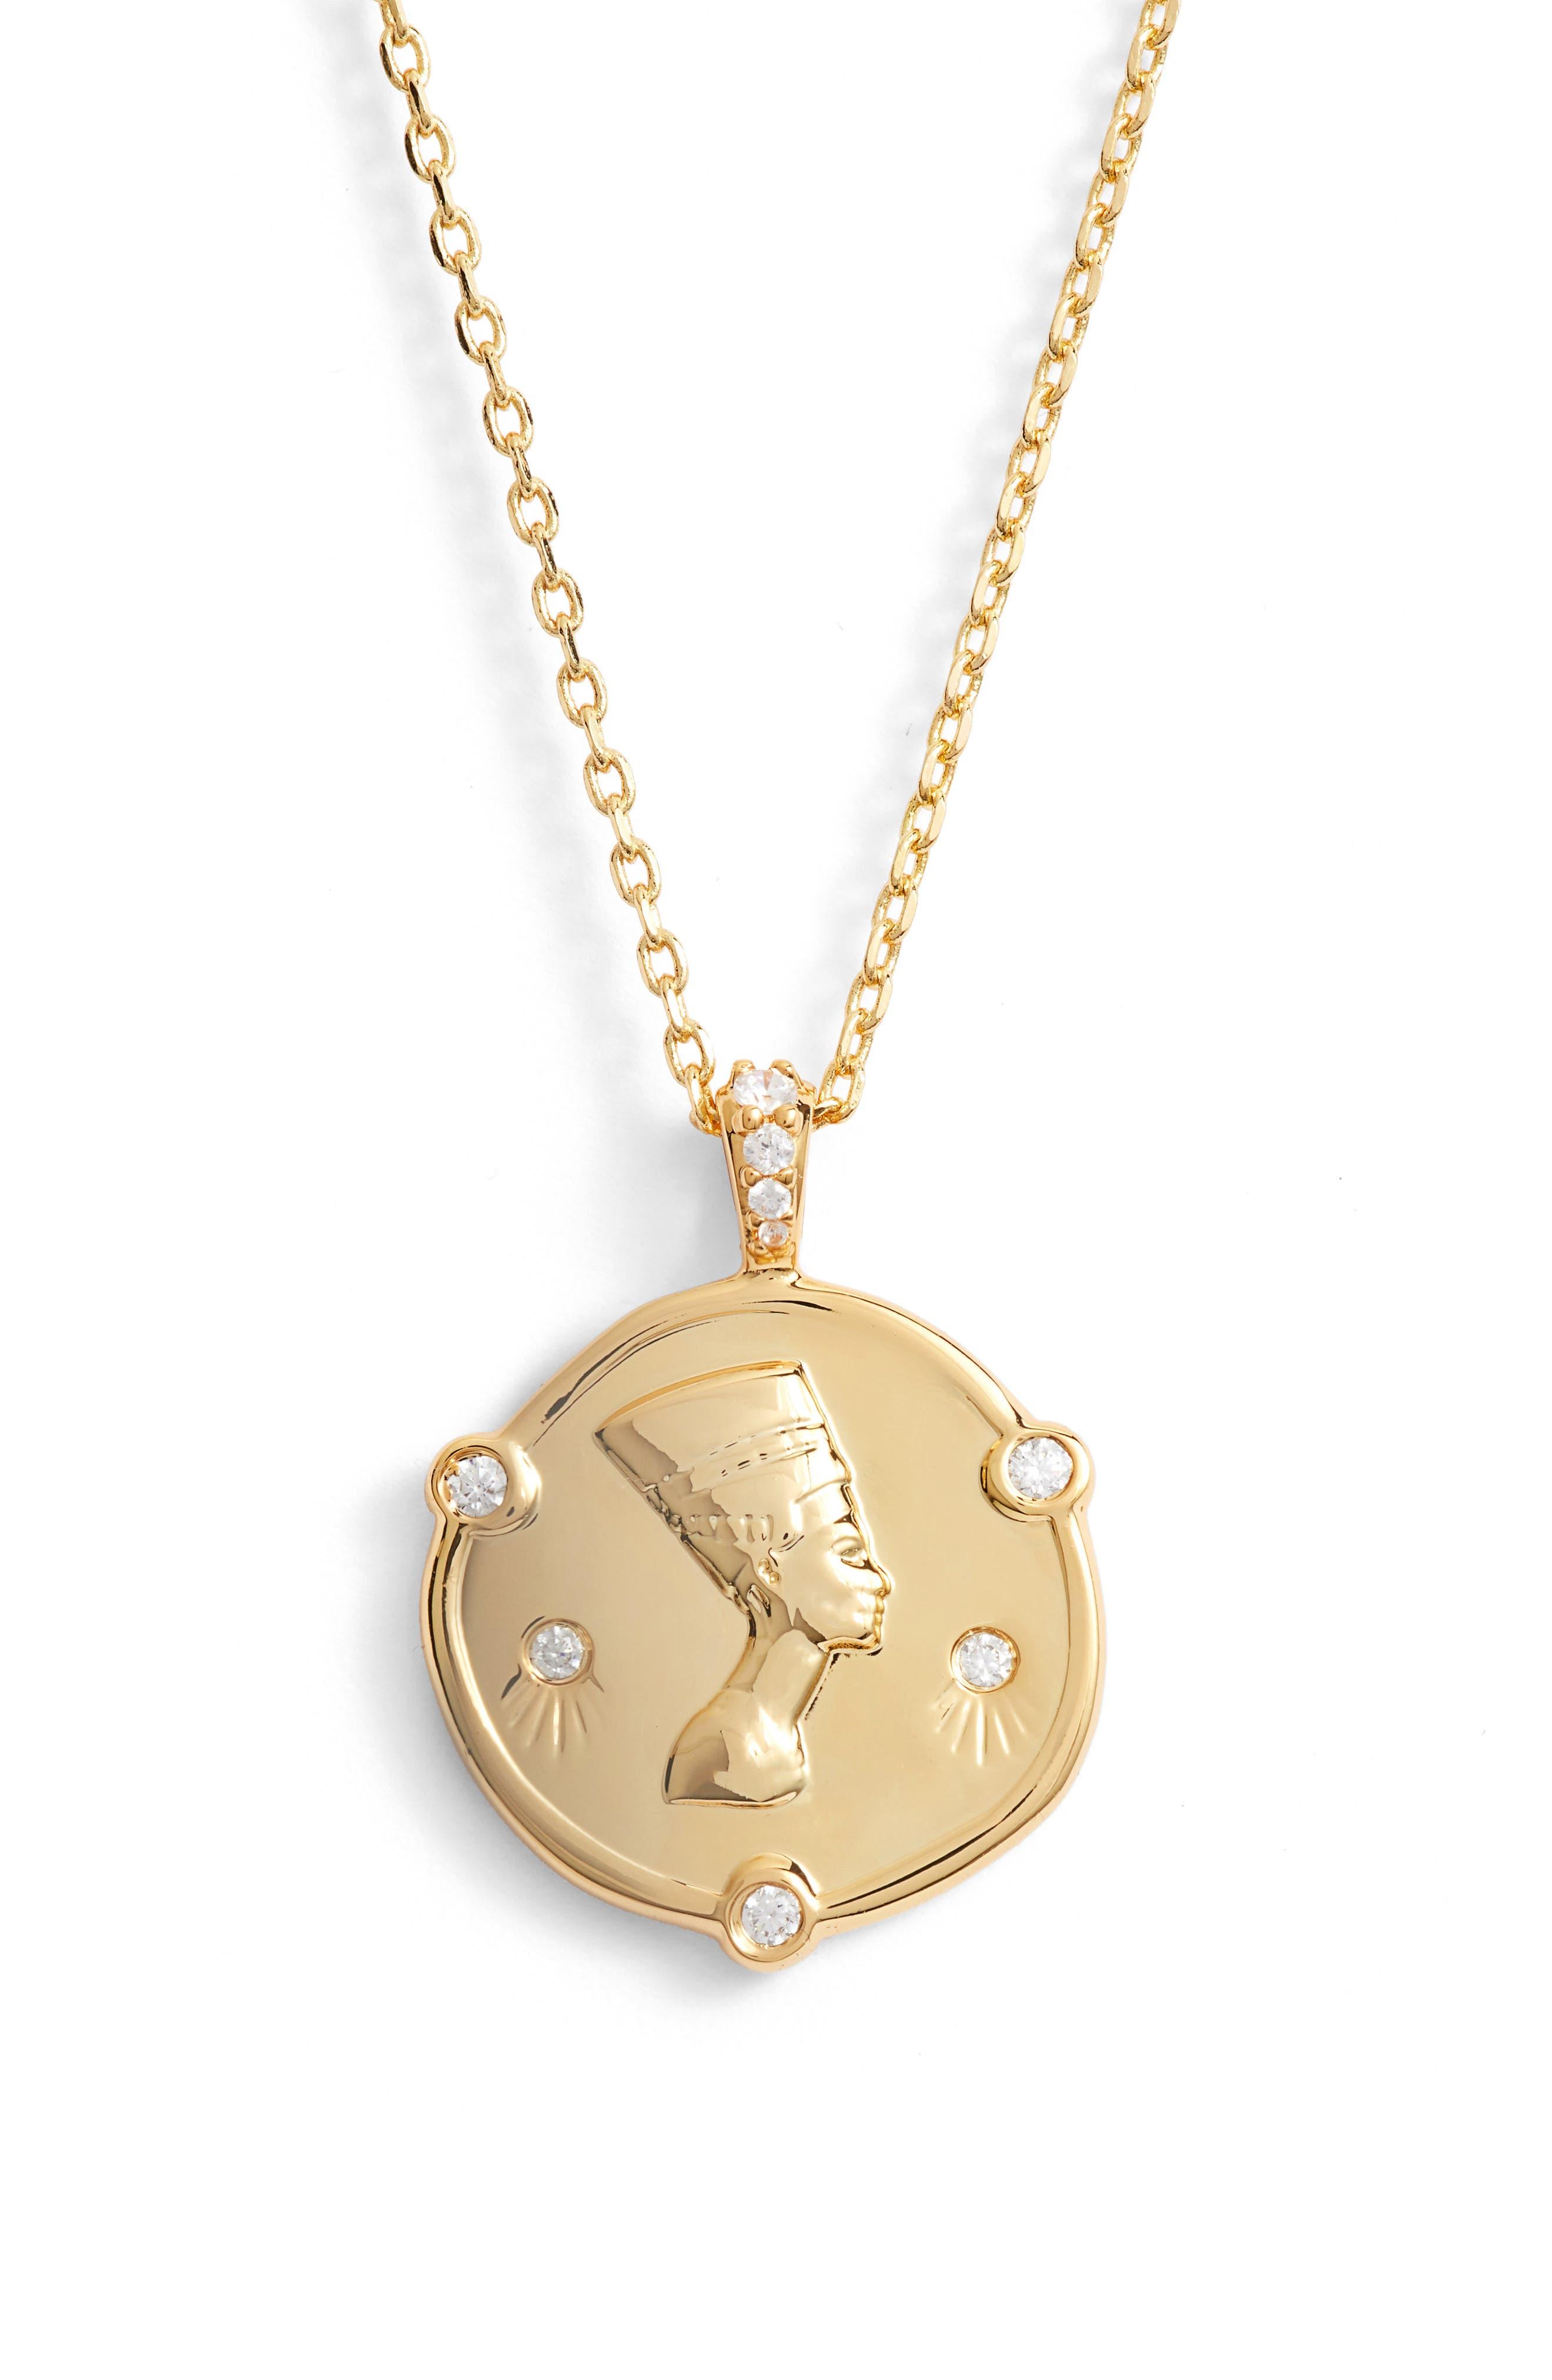 LULU DK Nefertiti Crystal Pendant Necklace in Gold